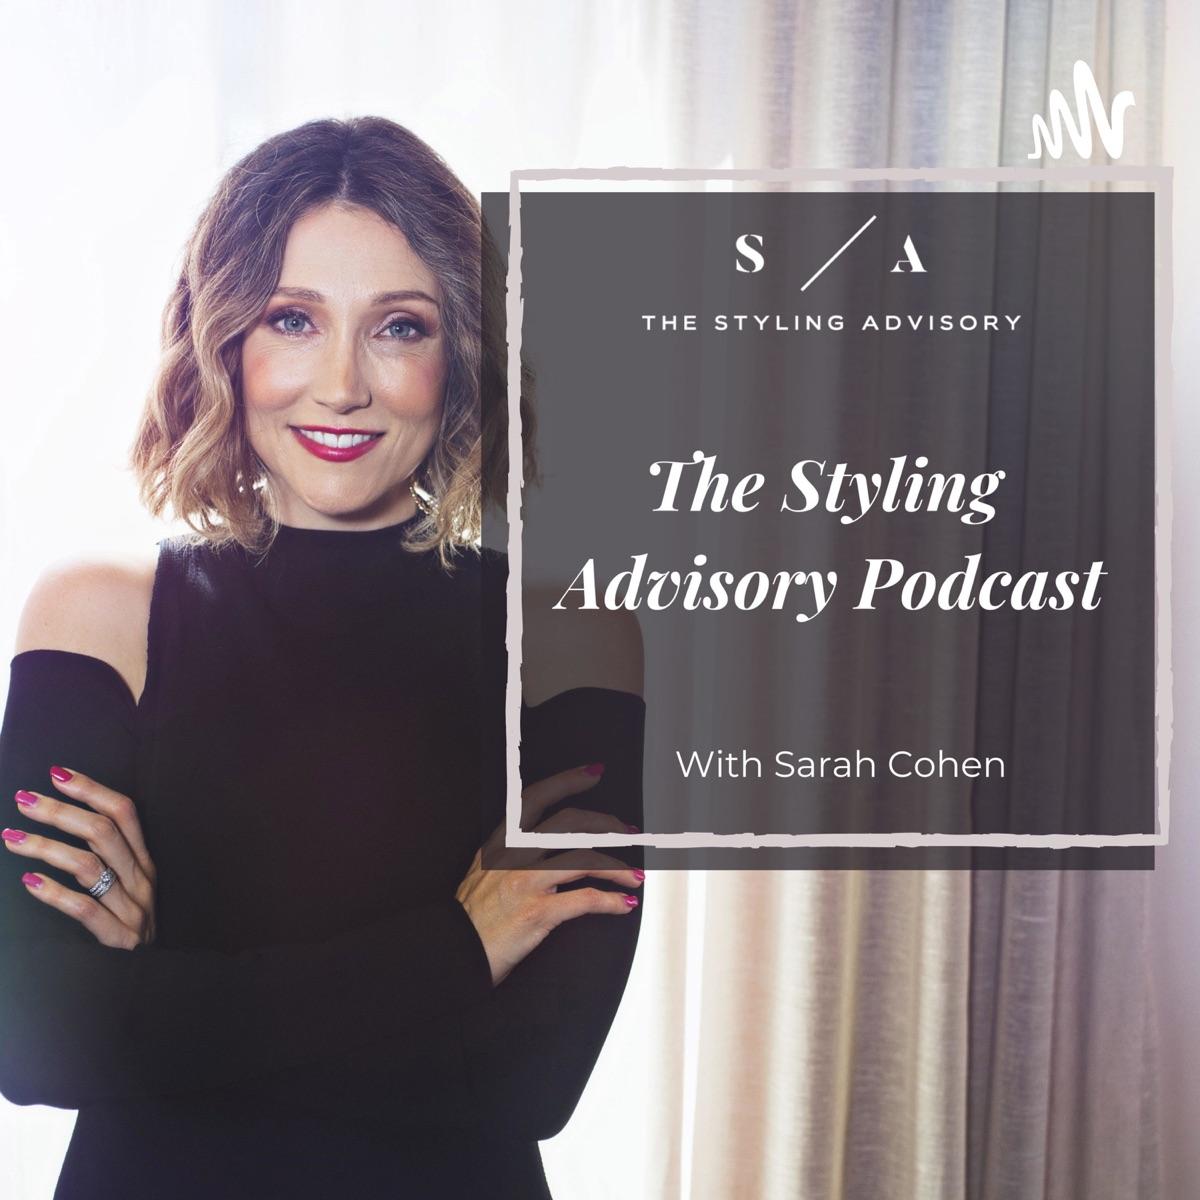 The Styling Advisory Podcast